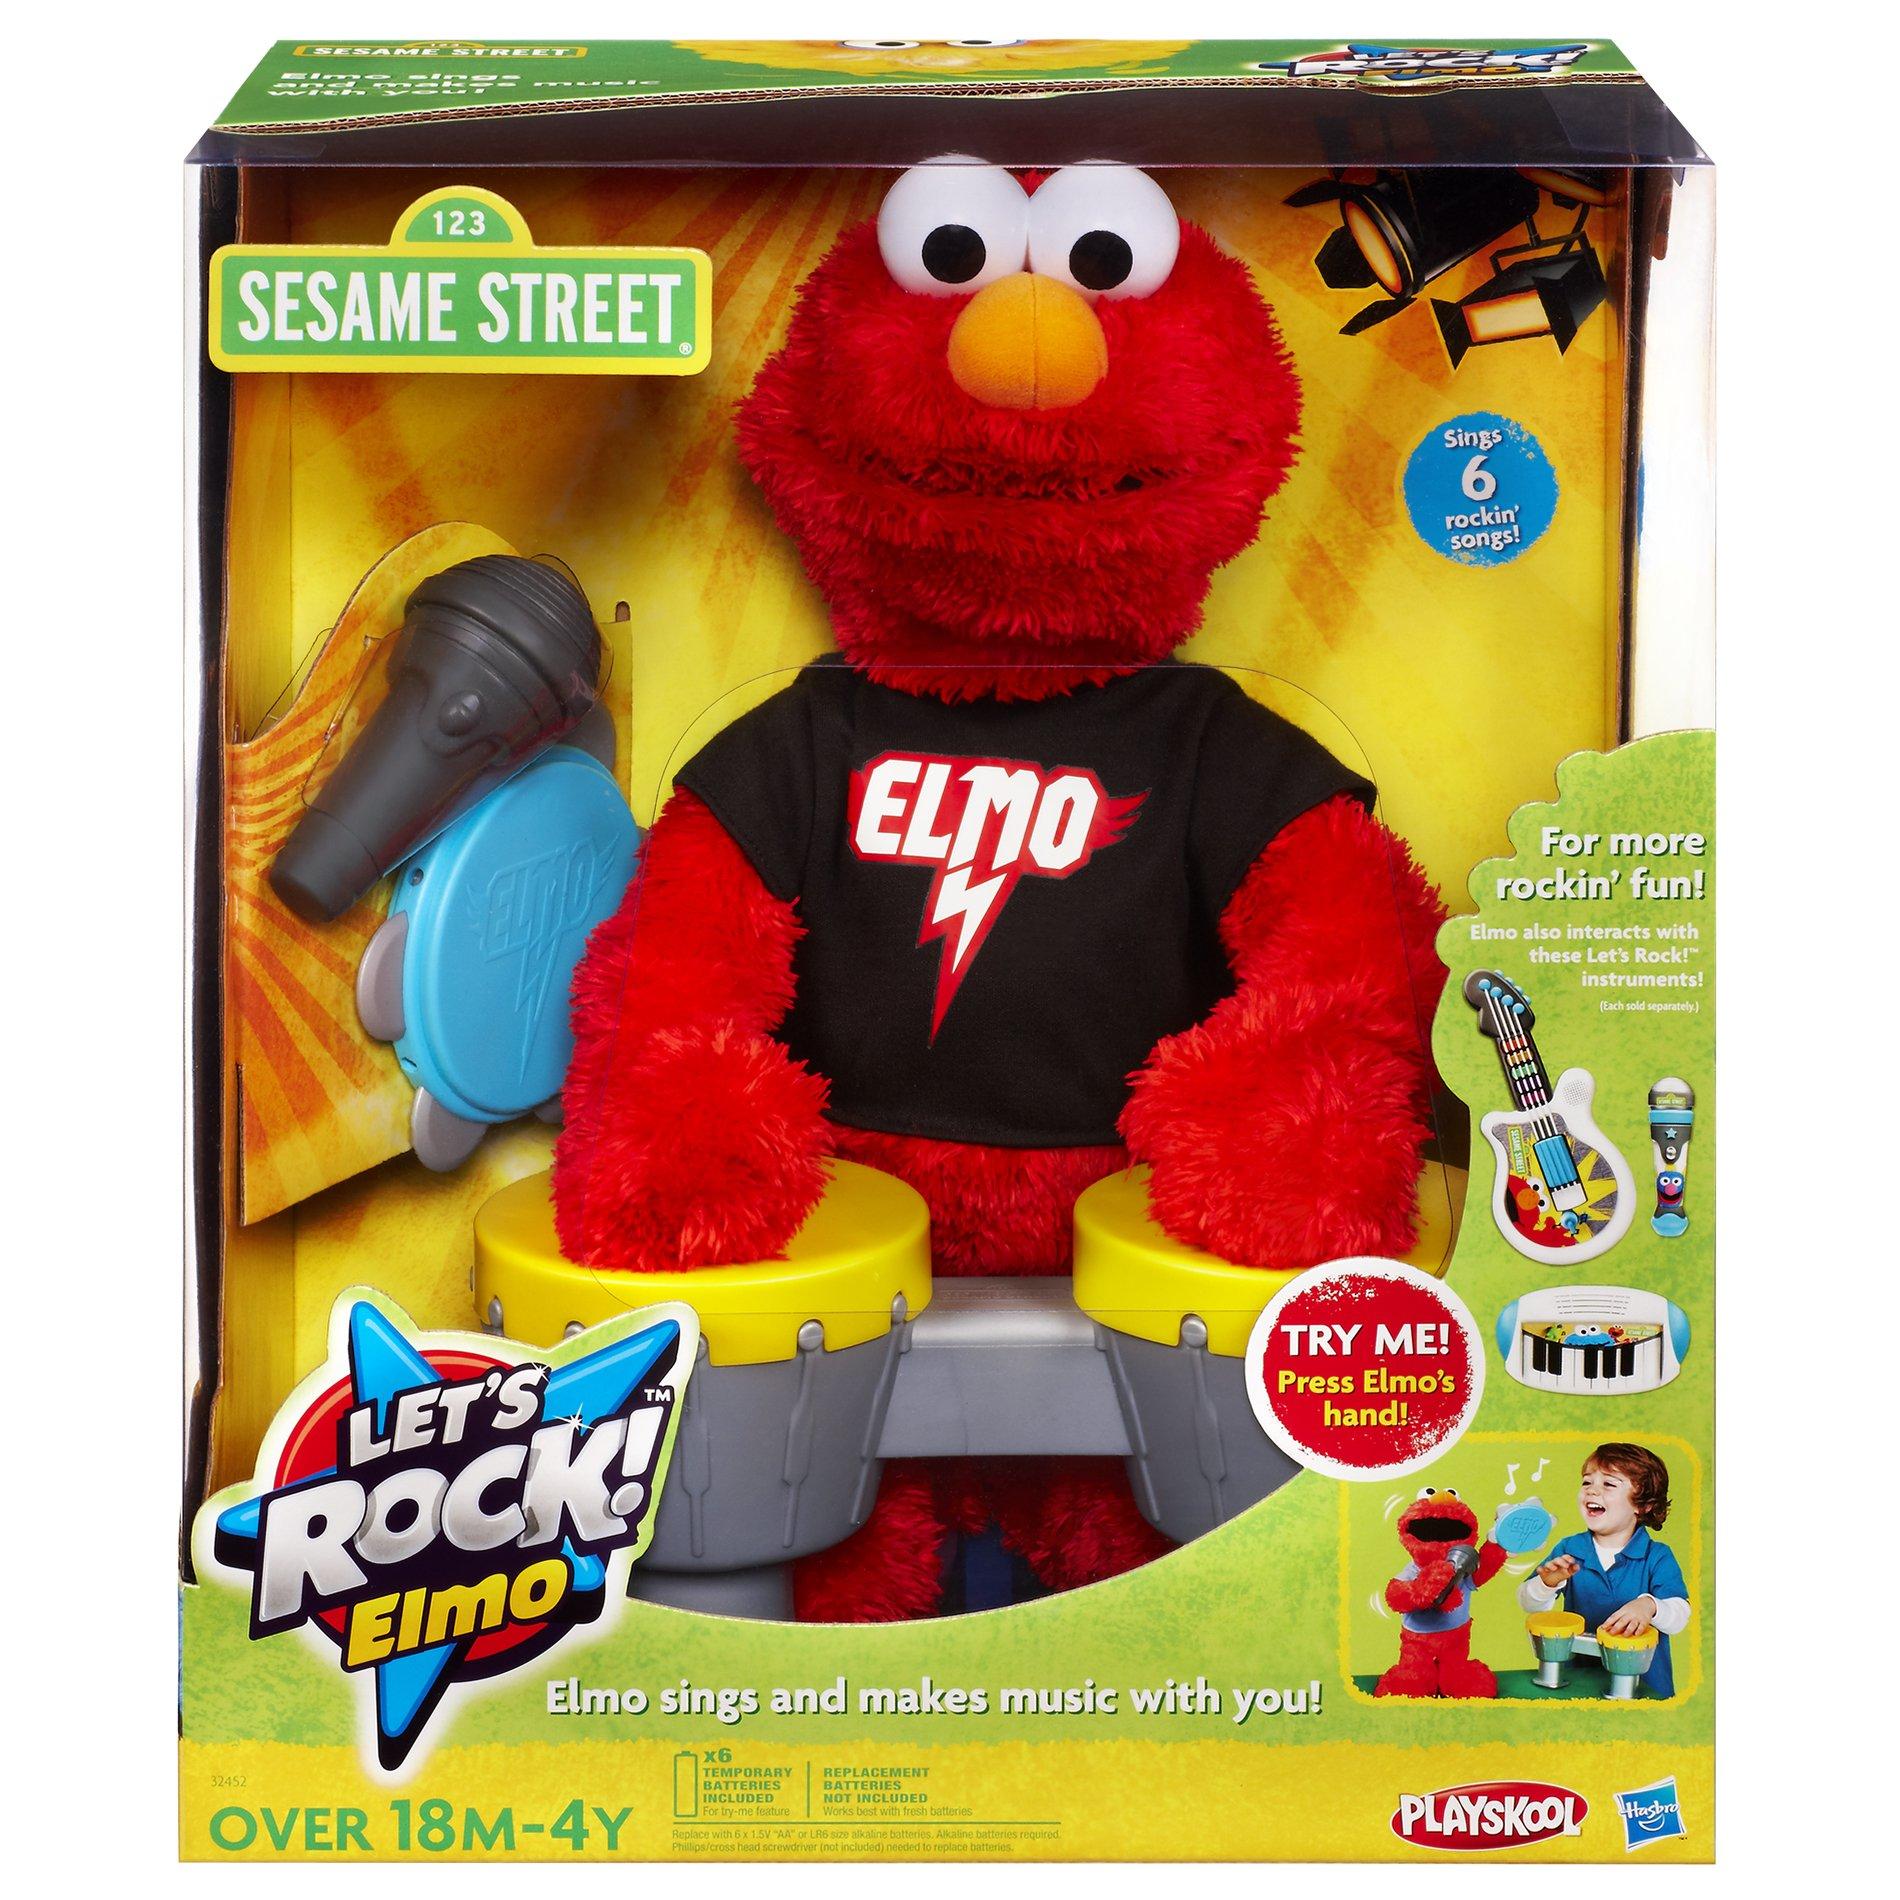 Sesame Street Let's Rock Elmo by Sesame Street (Image #5)